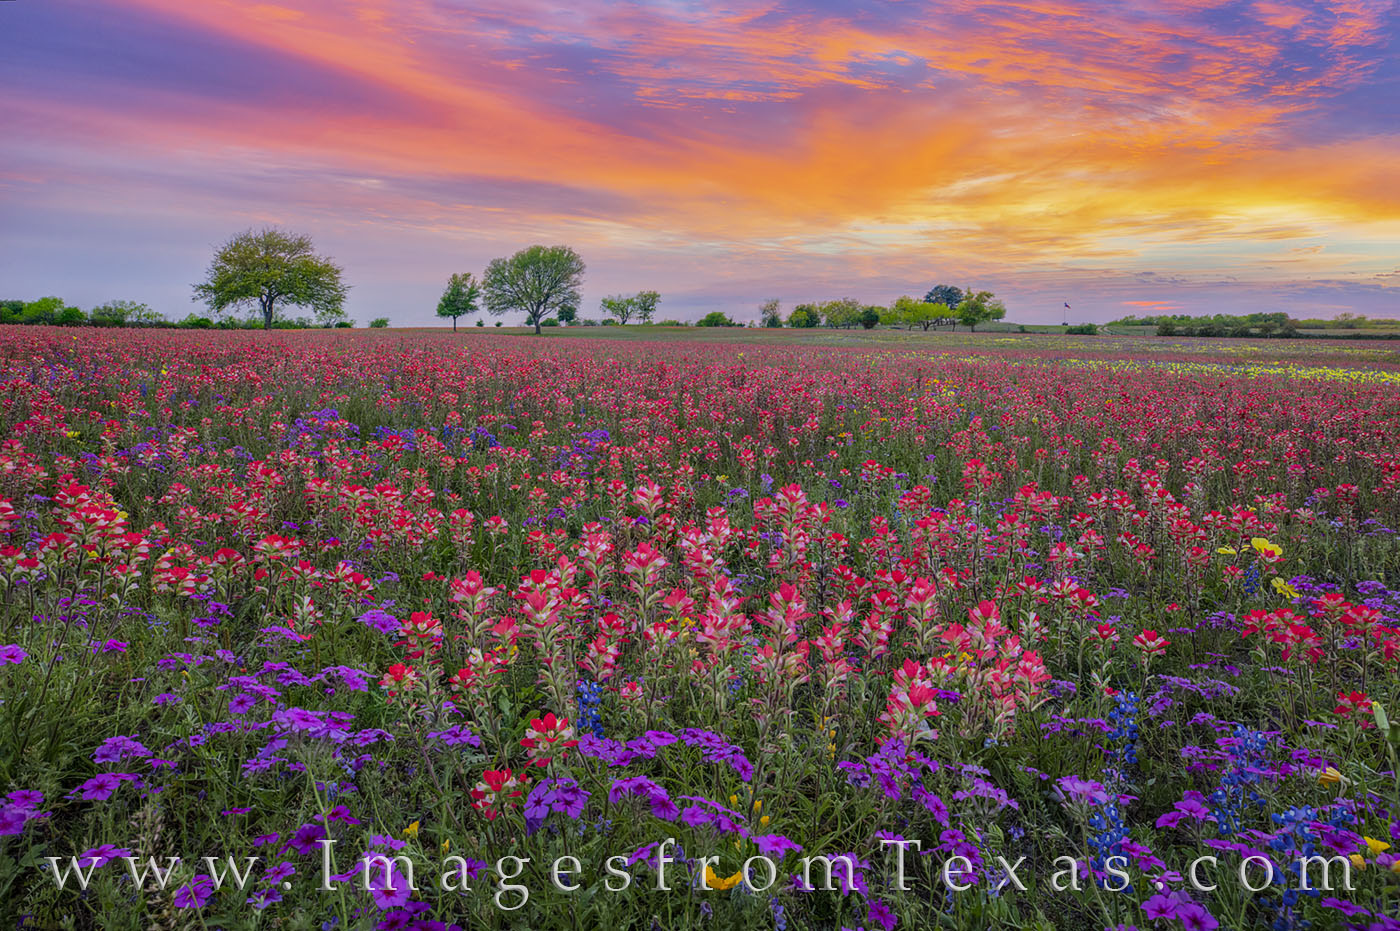 Wildflowers, Texas, bluebonnets, phlox, groundsel, coreopsis, Missouri primrose, primrose, buttercups, paintbrush, new berlin, church road, san Antonio, spring, march, photo